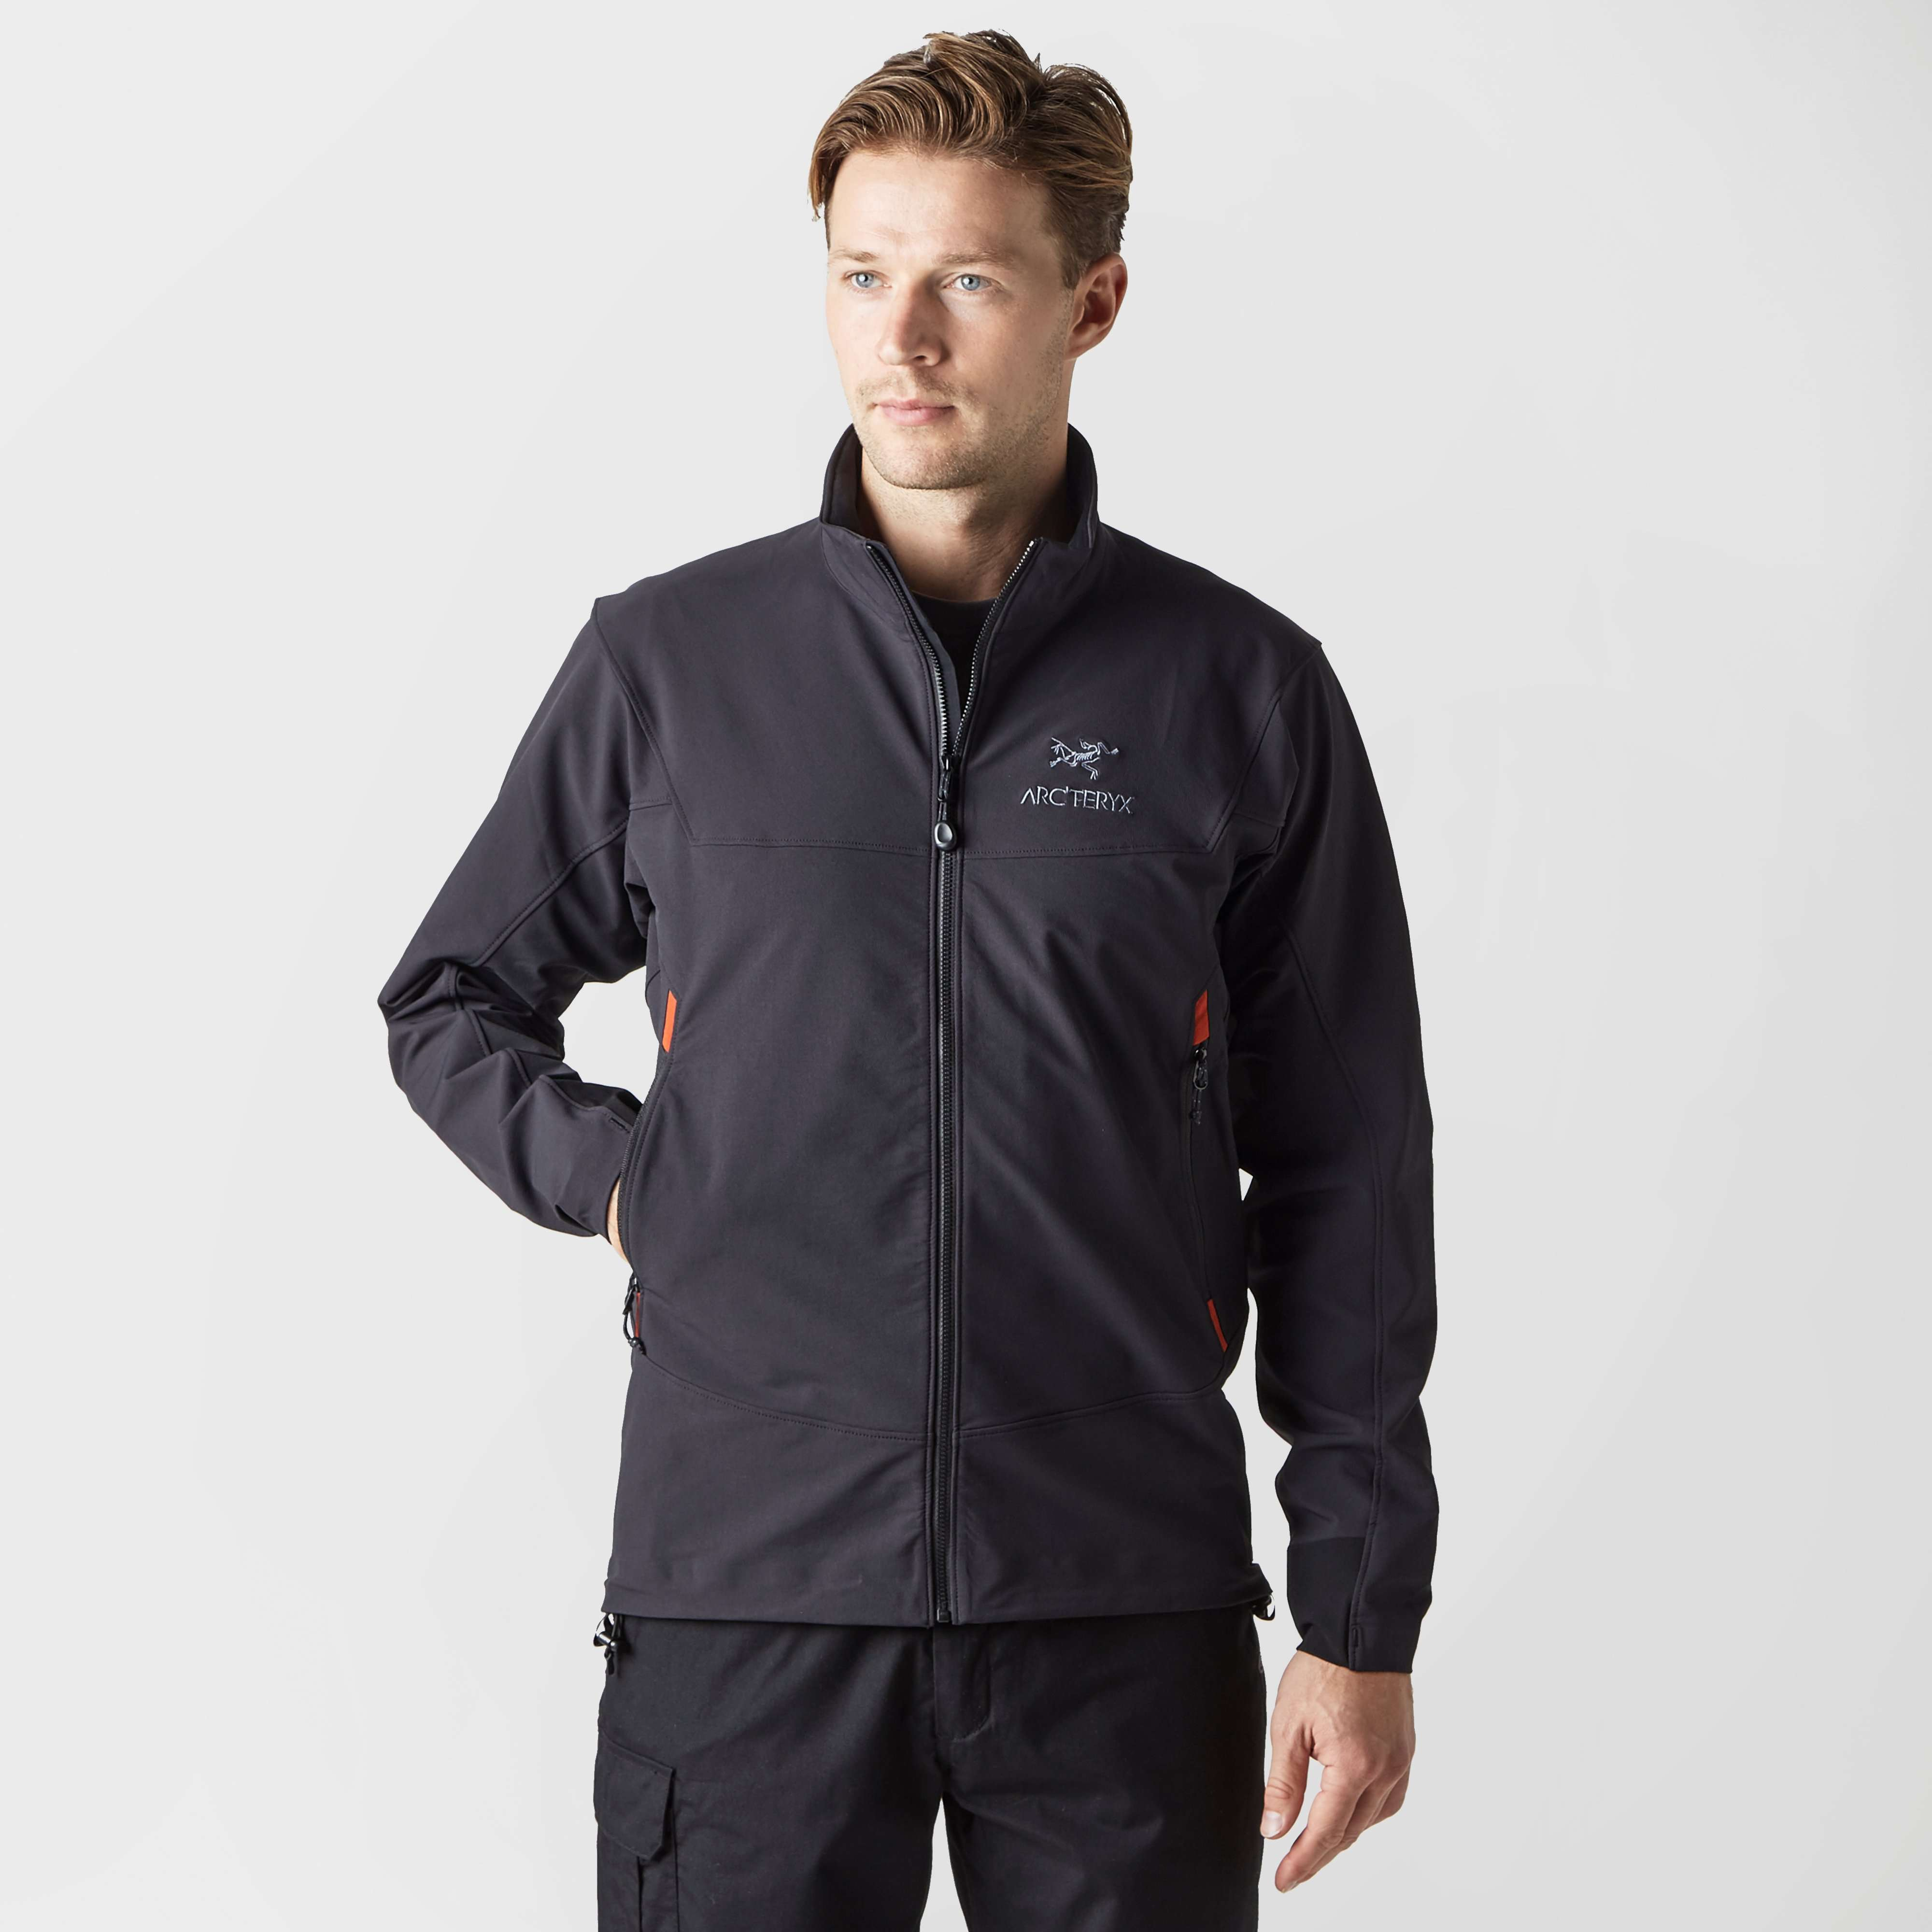 ARC'TERYX Men's Gamma LT Softshell Jacket